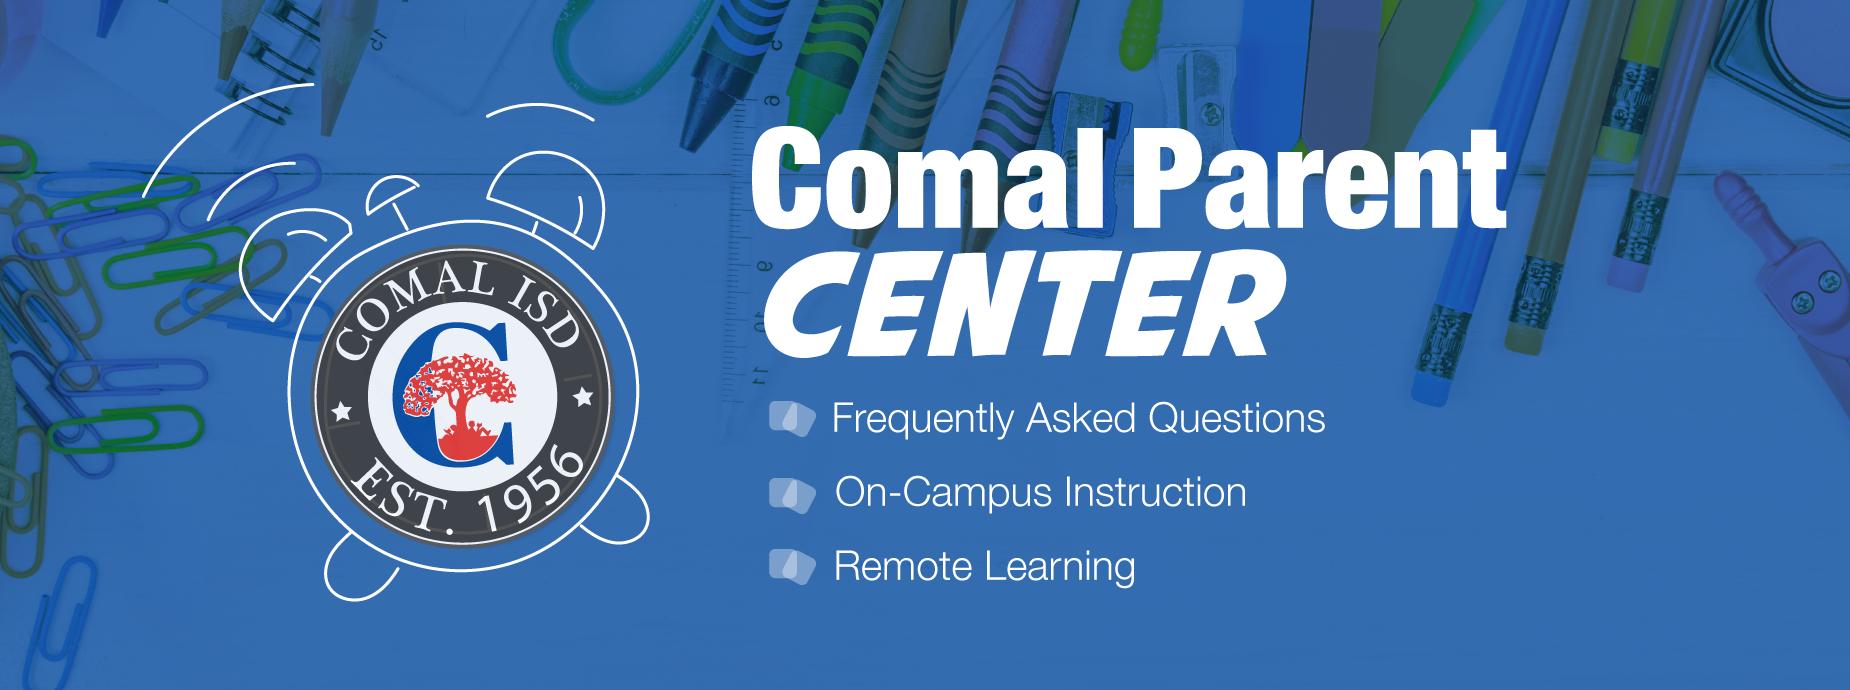 Comal Parent Center Banner